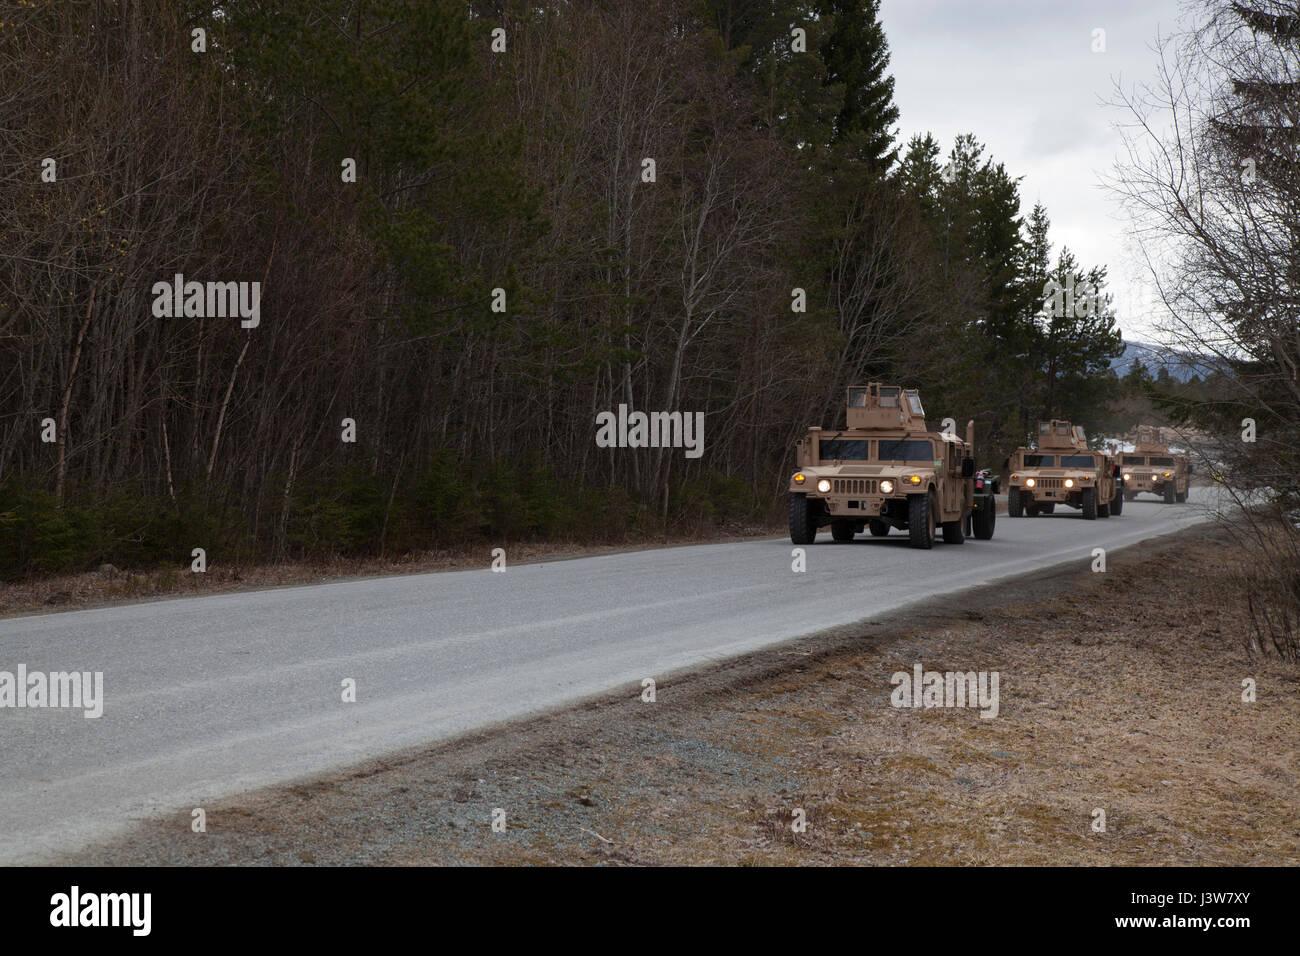 U.S. Marines with 2nd Transportation Support Battalion, Combat Logistics Regiment 2, 2nd Marine Logistics Group Stock Photo